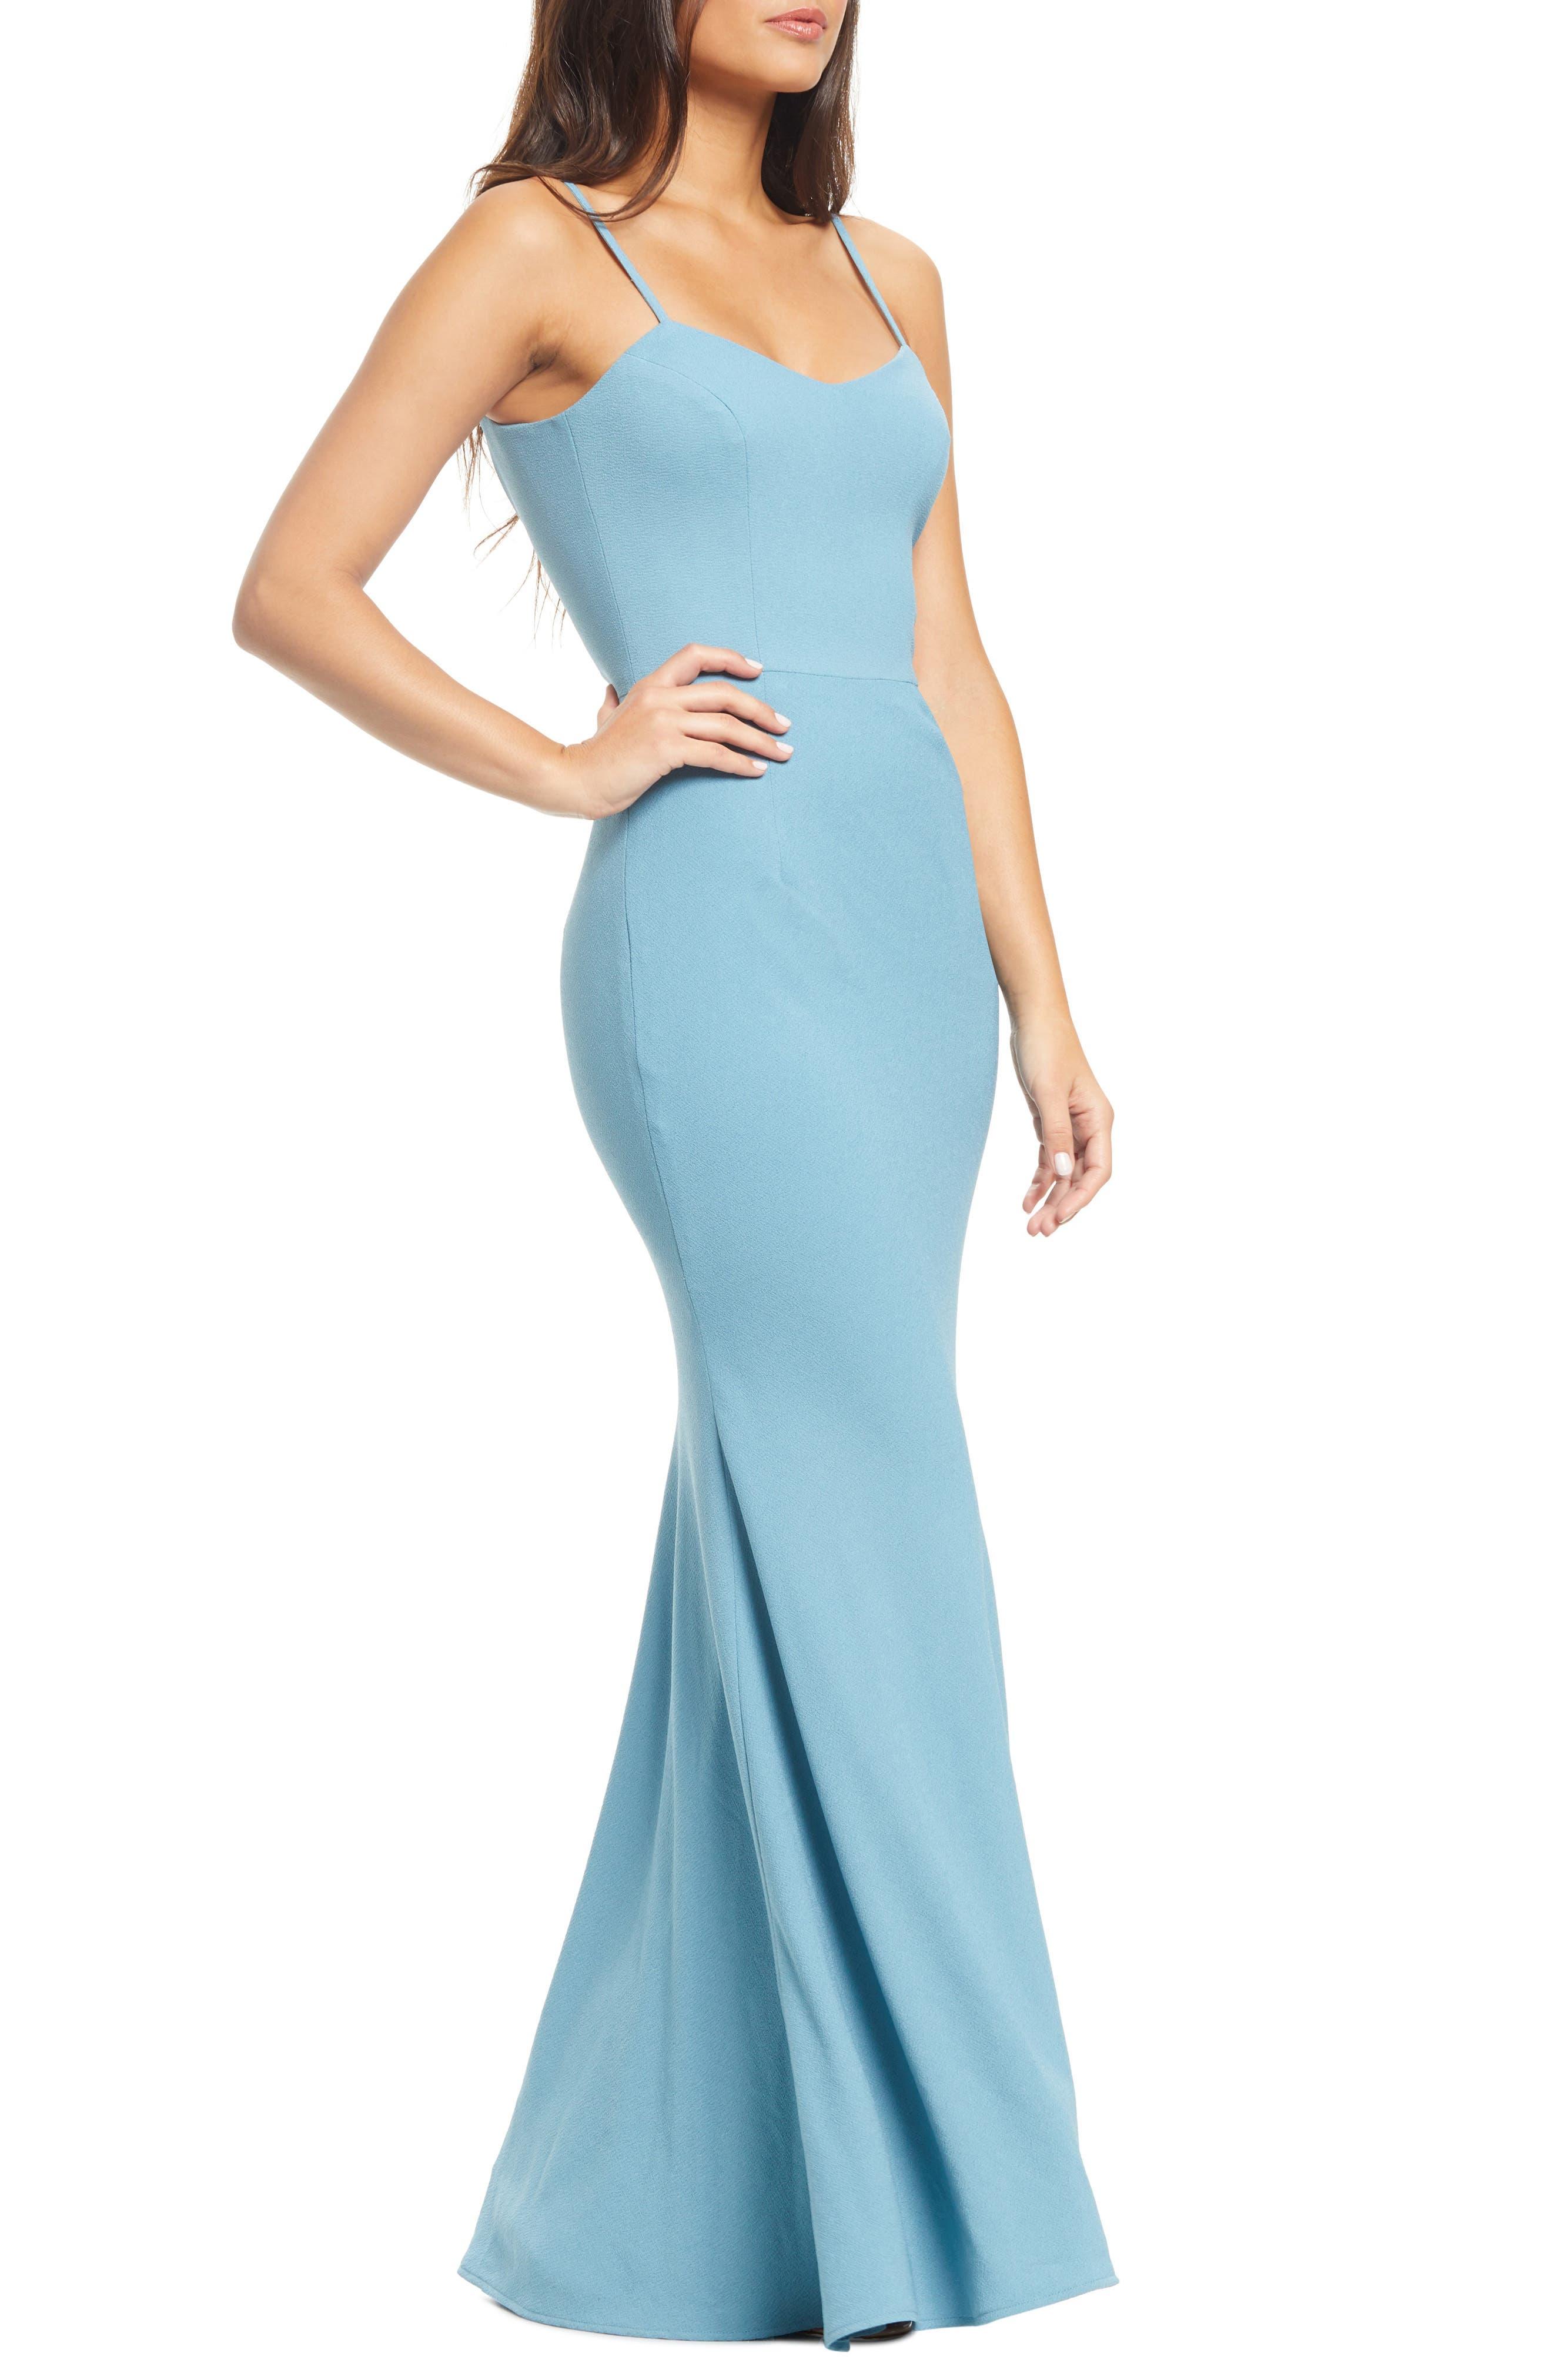 Jodi Crepe Evening Dress by Dress The Population